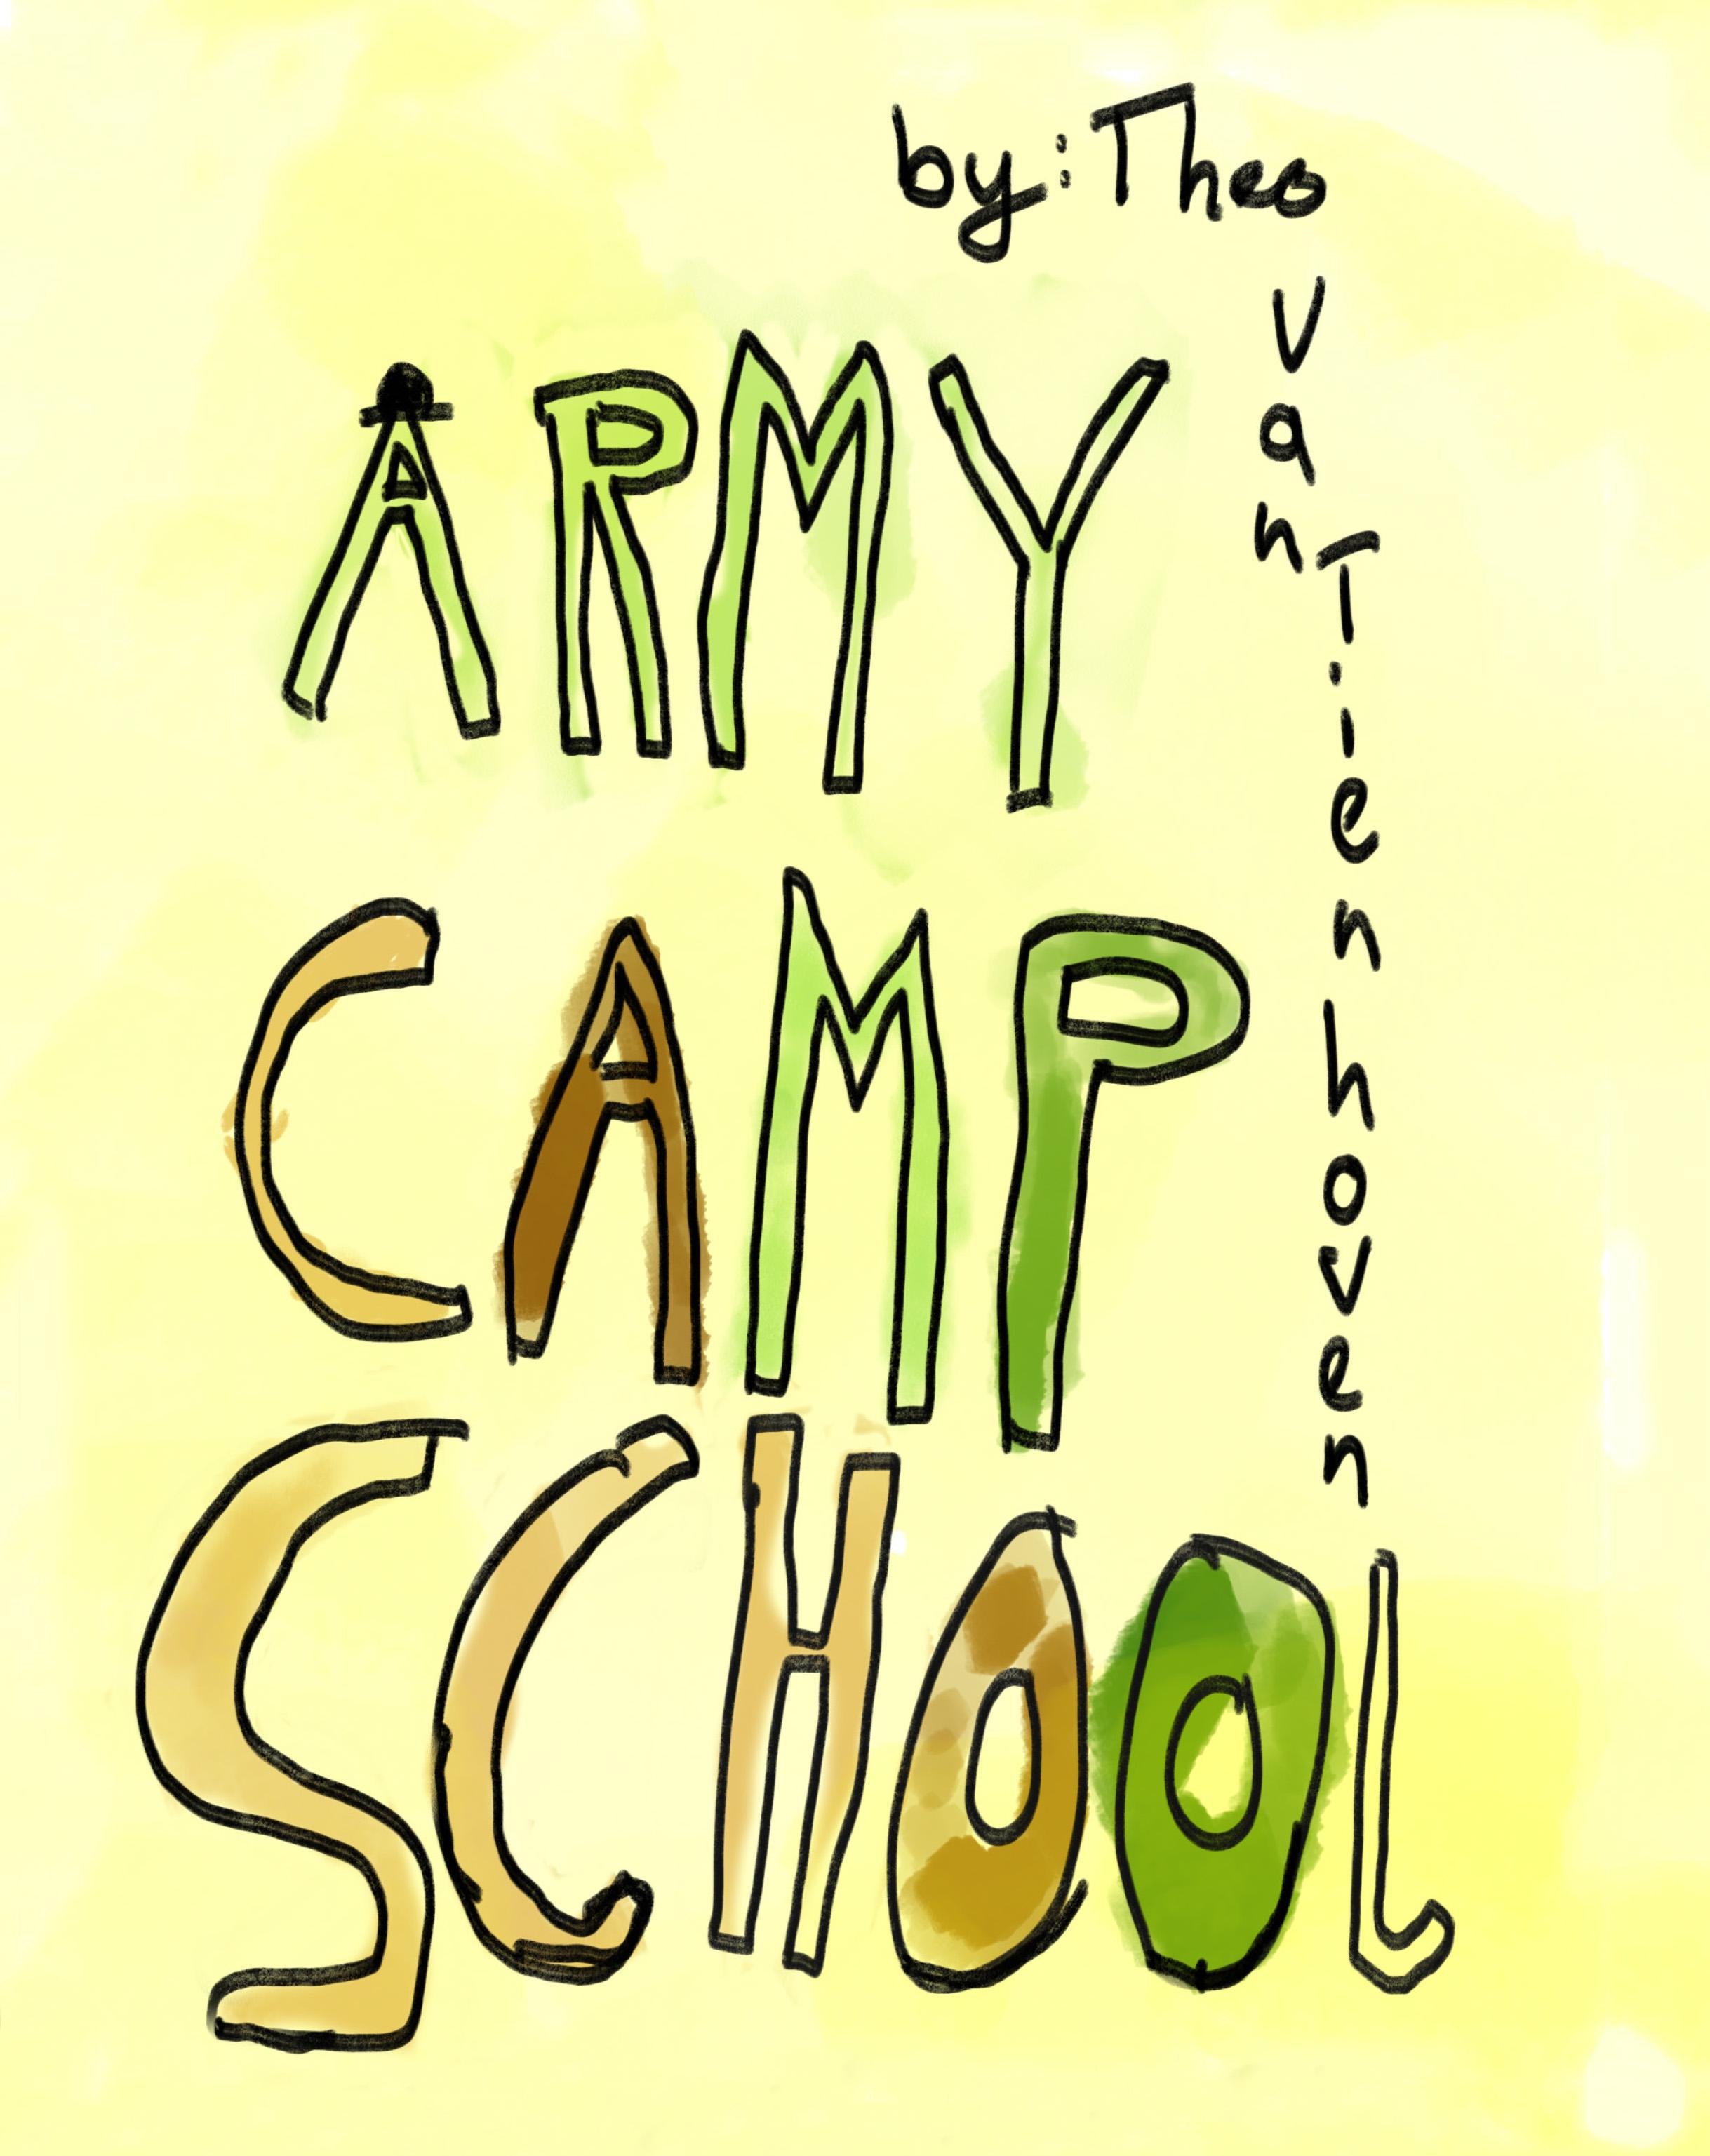 Army Camp School    by Theo Van Tienhoven